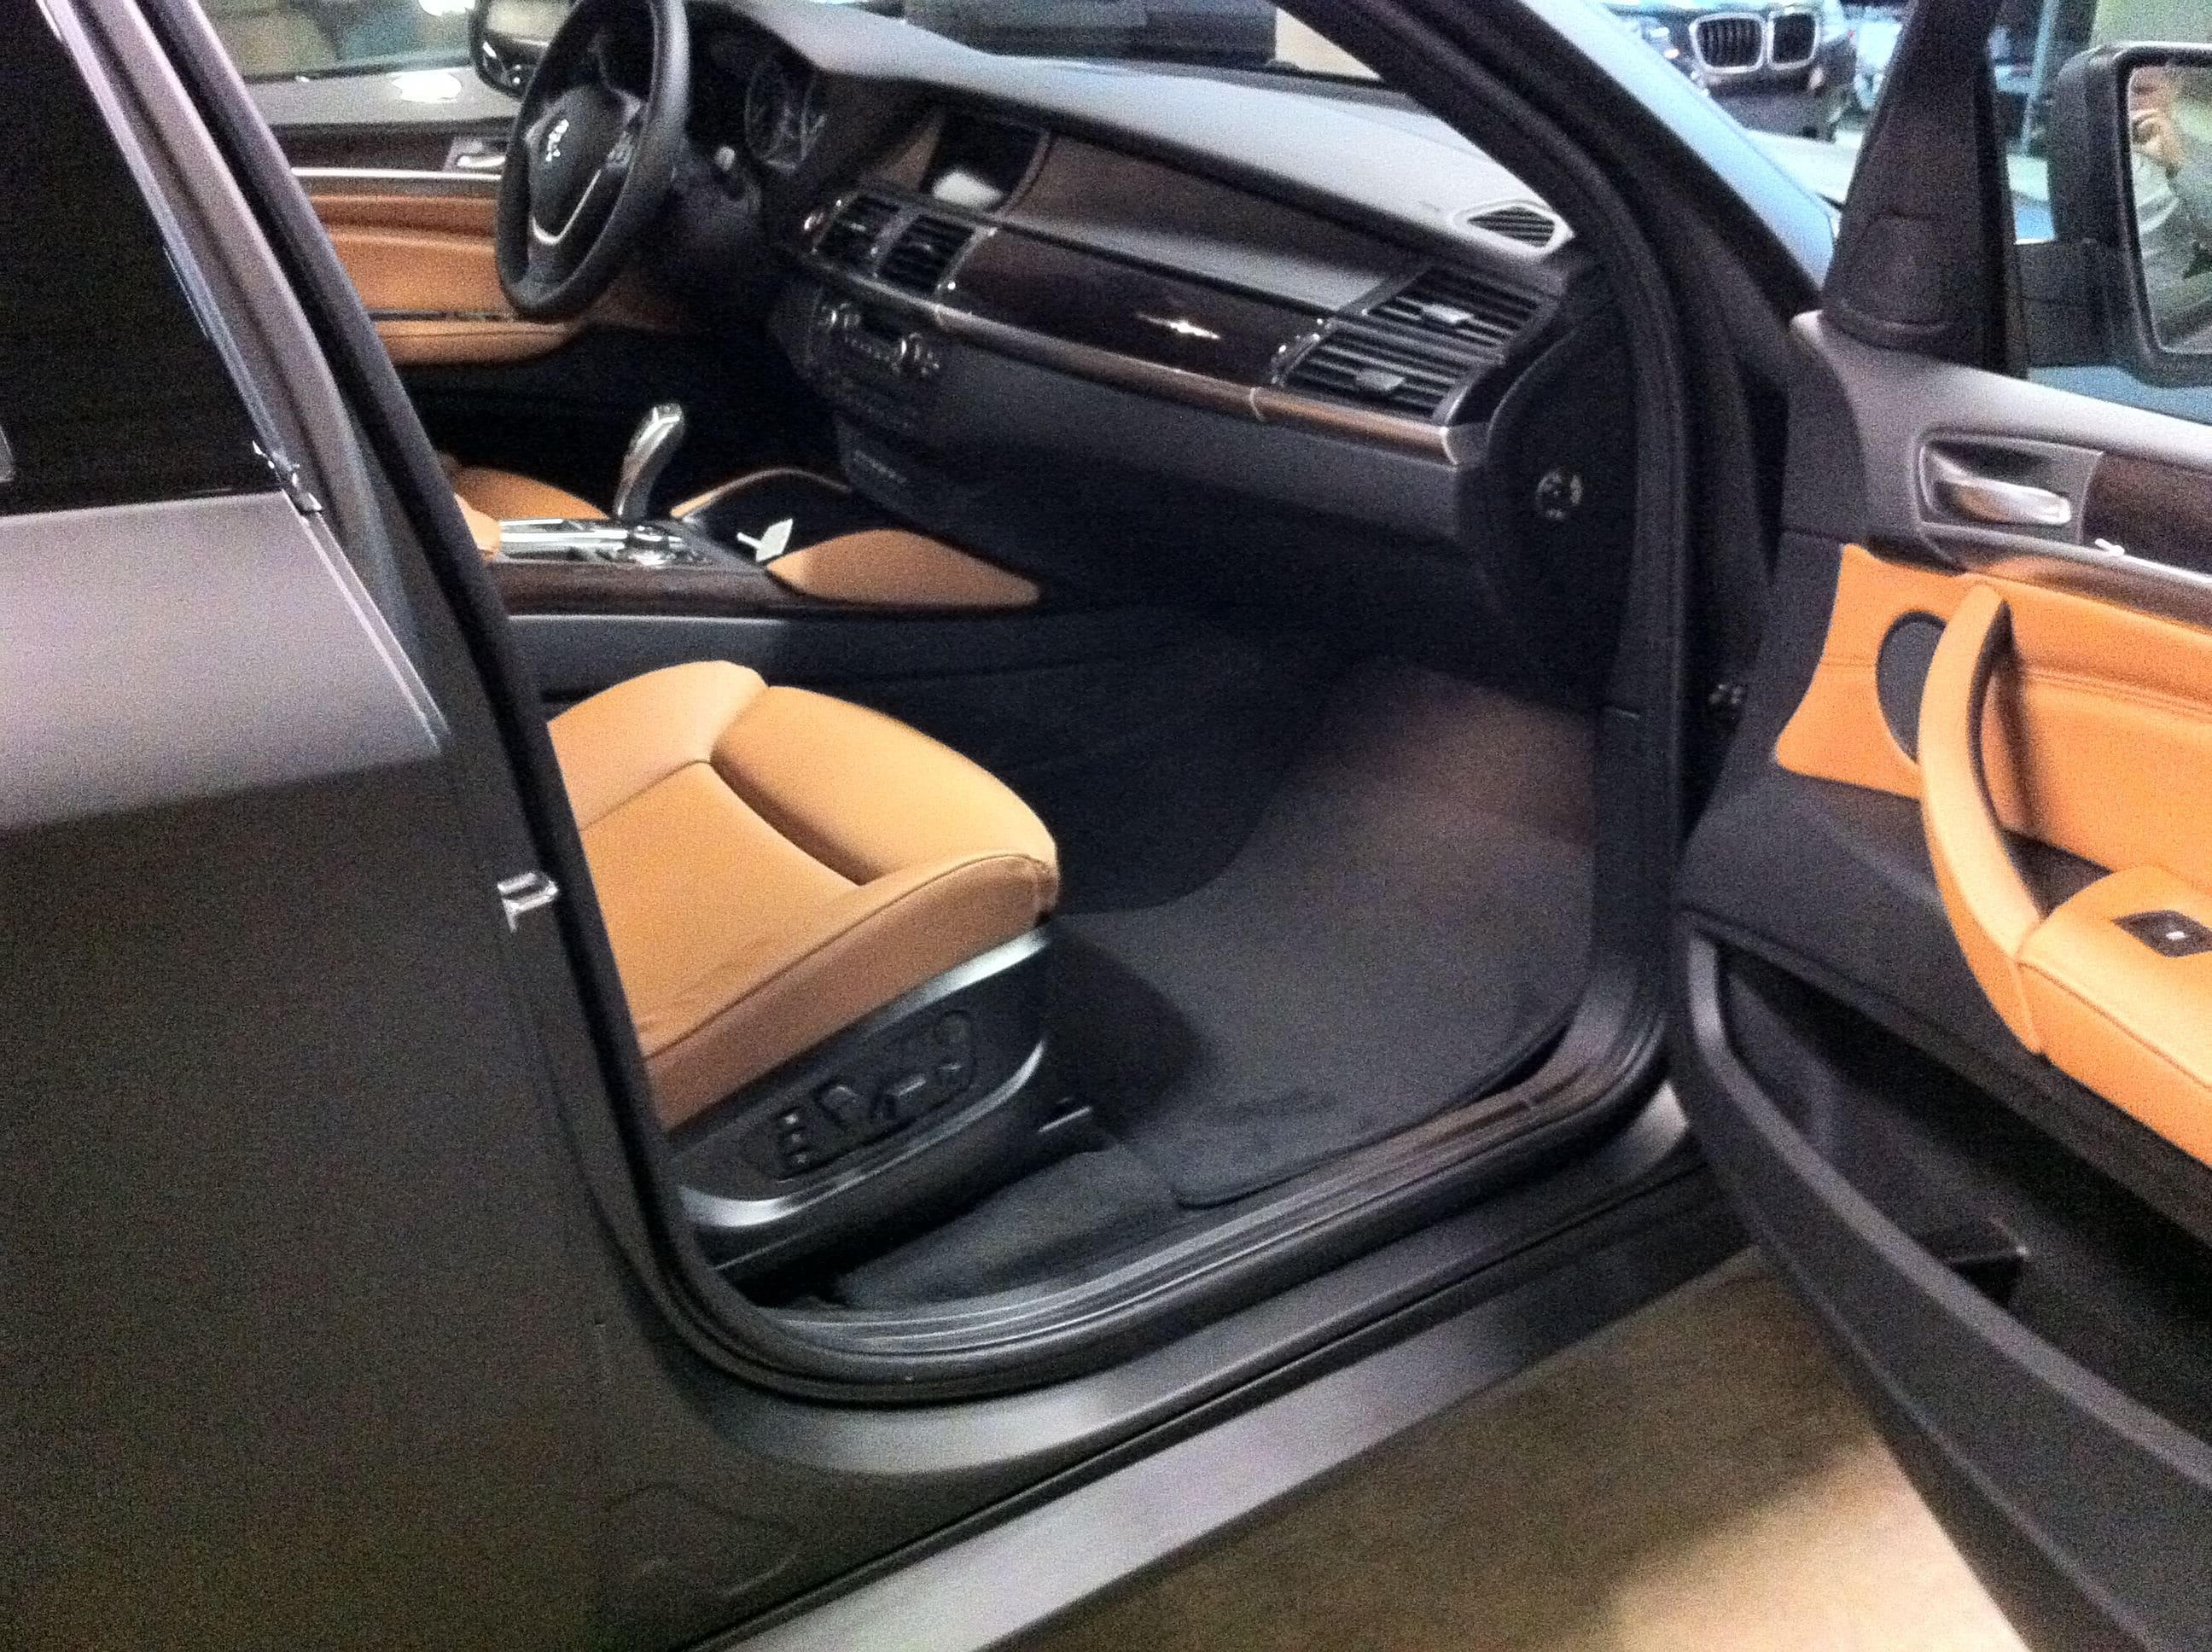 BMW X6 met Mat Zwarte Wrap, Carwrapping door Wrapmyride.nu Foto-nr:5490, ©2020